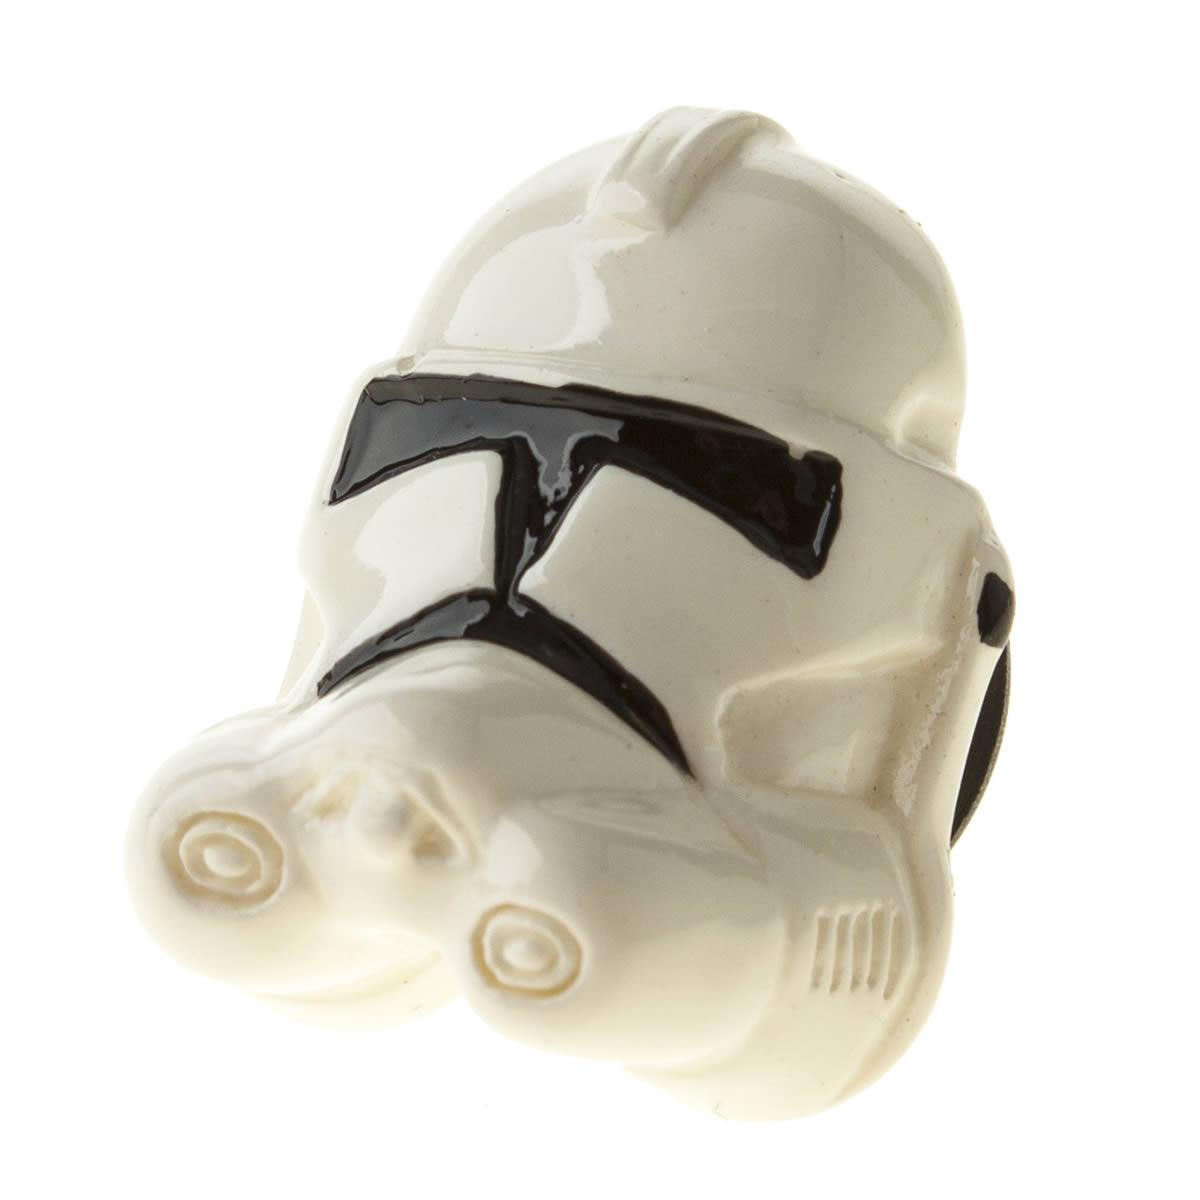 jibbitz Jibbitz White & Black Storm Trooper Shoe Accessories